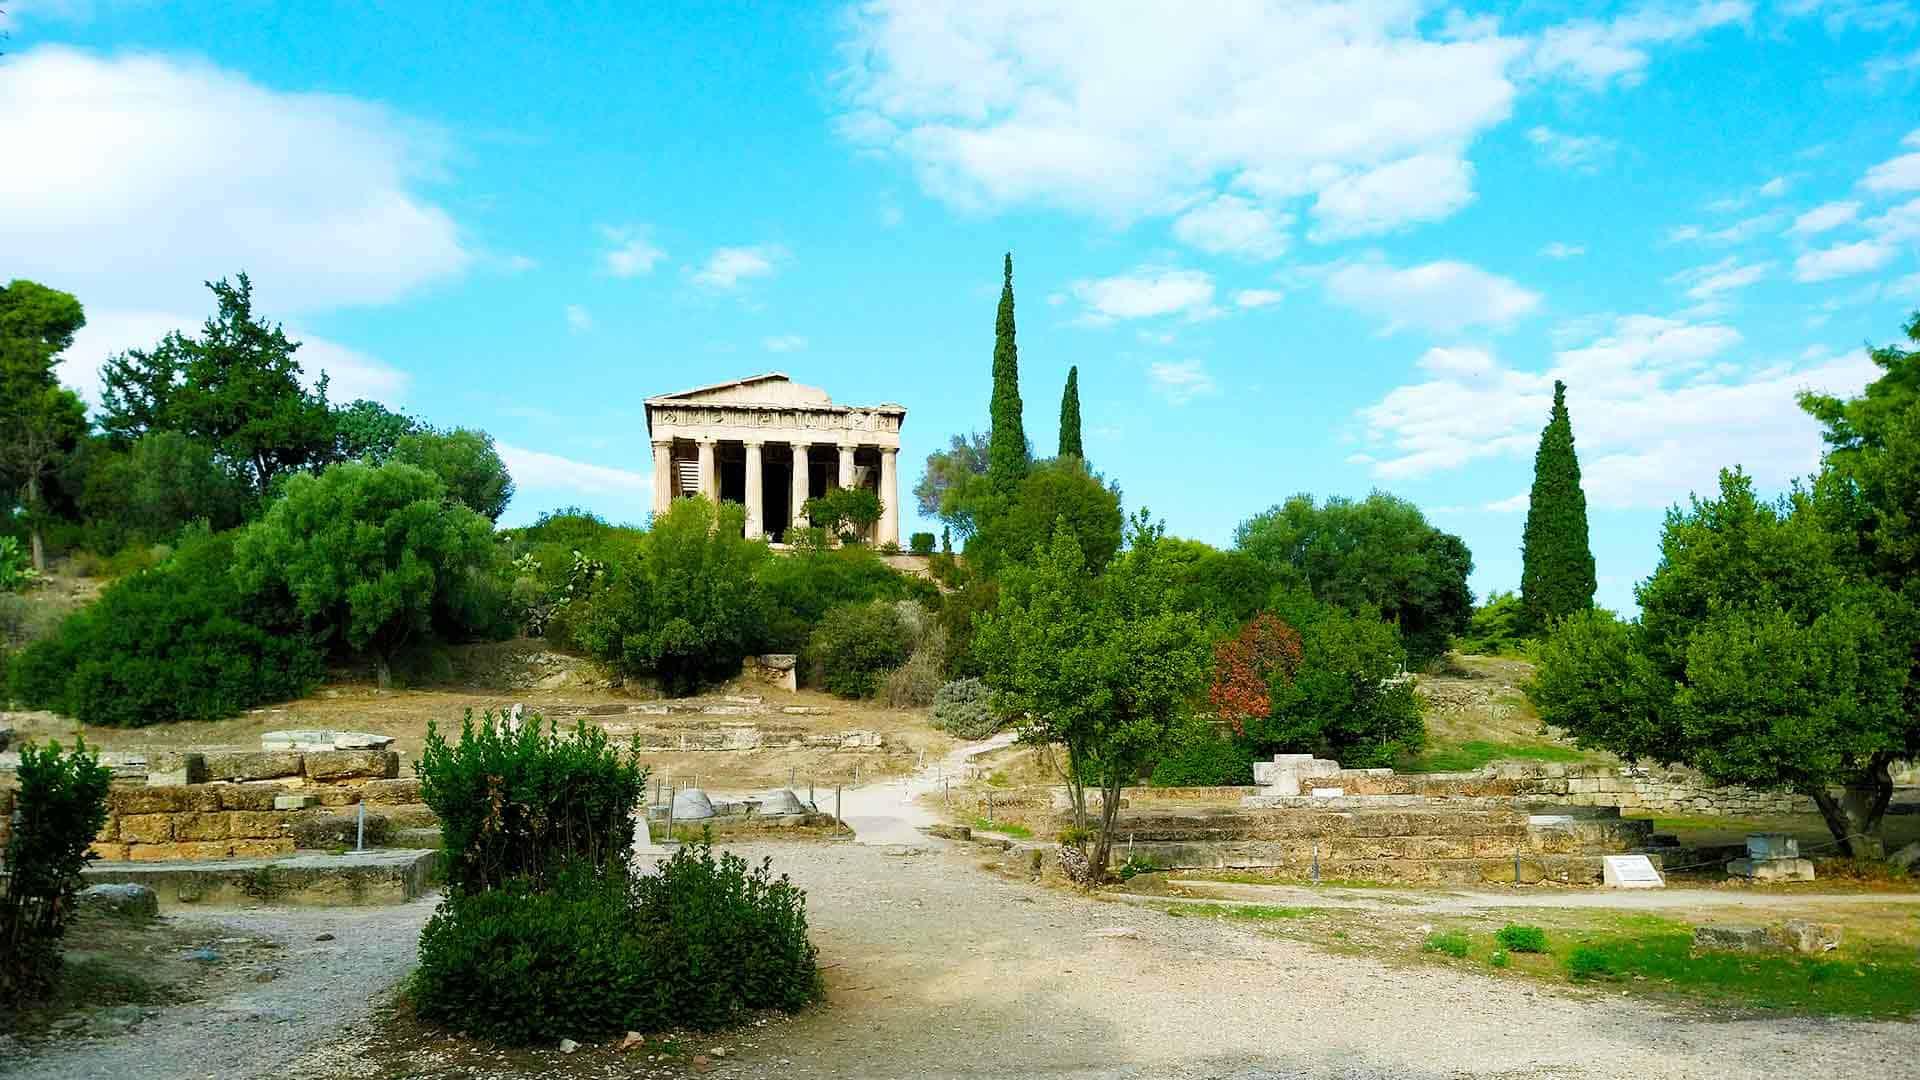 Temple-of-Hephaestus-in-Ancient-Agora,-Athens